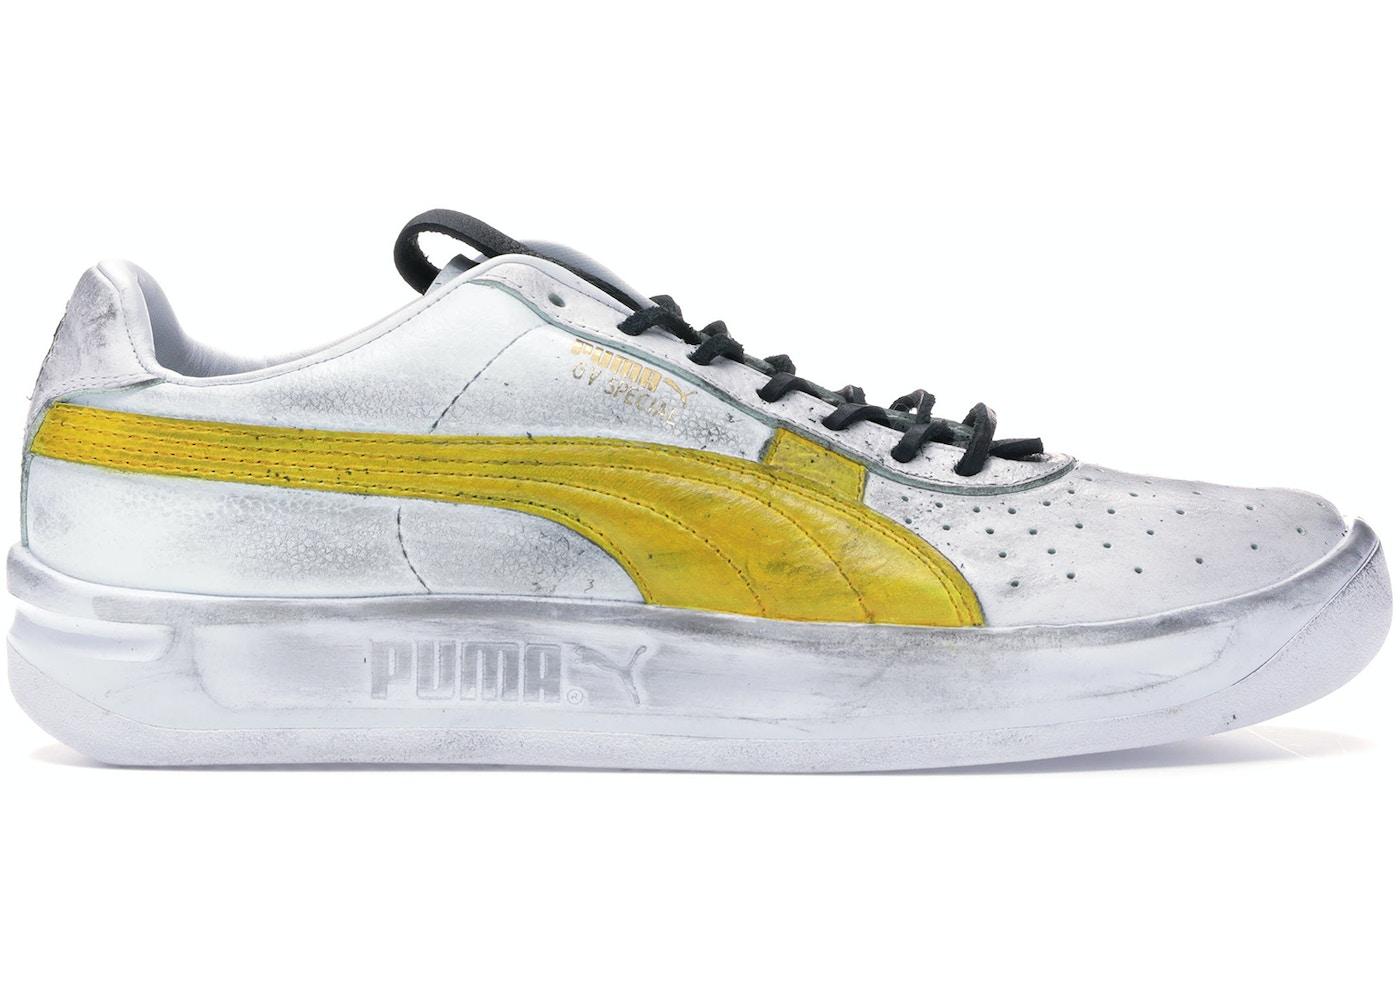 quality design d0aca cff78 Puma Shoes - Average Sale Price